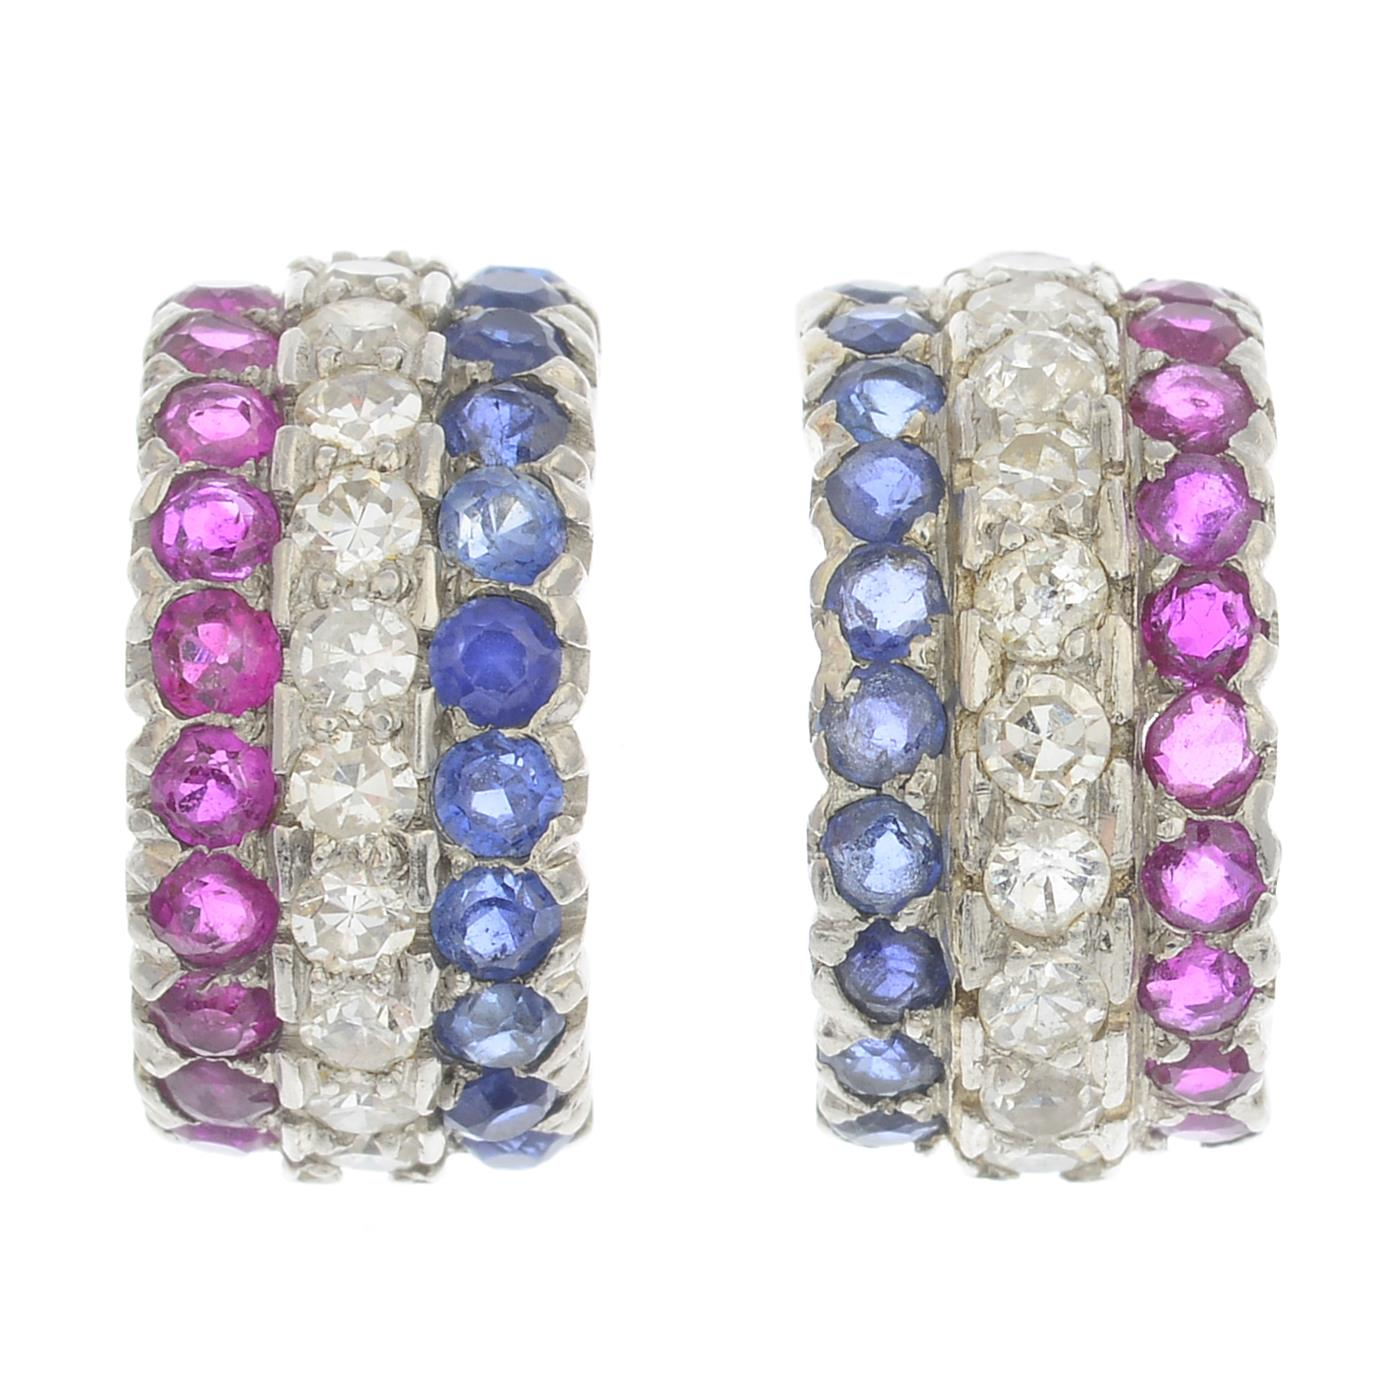 Lot 41 - A pair of sapphire, ruby and diamond half-hoop earrings.